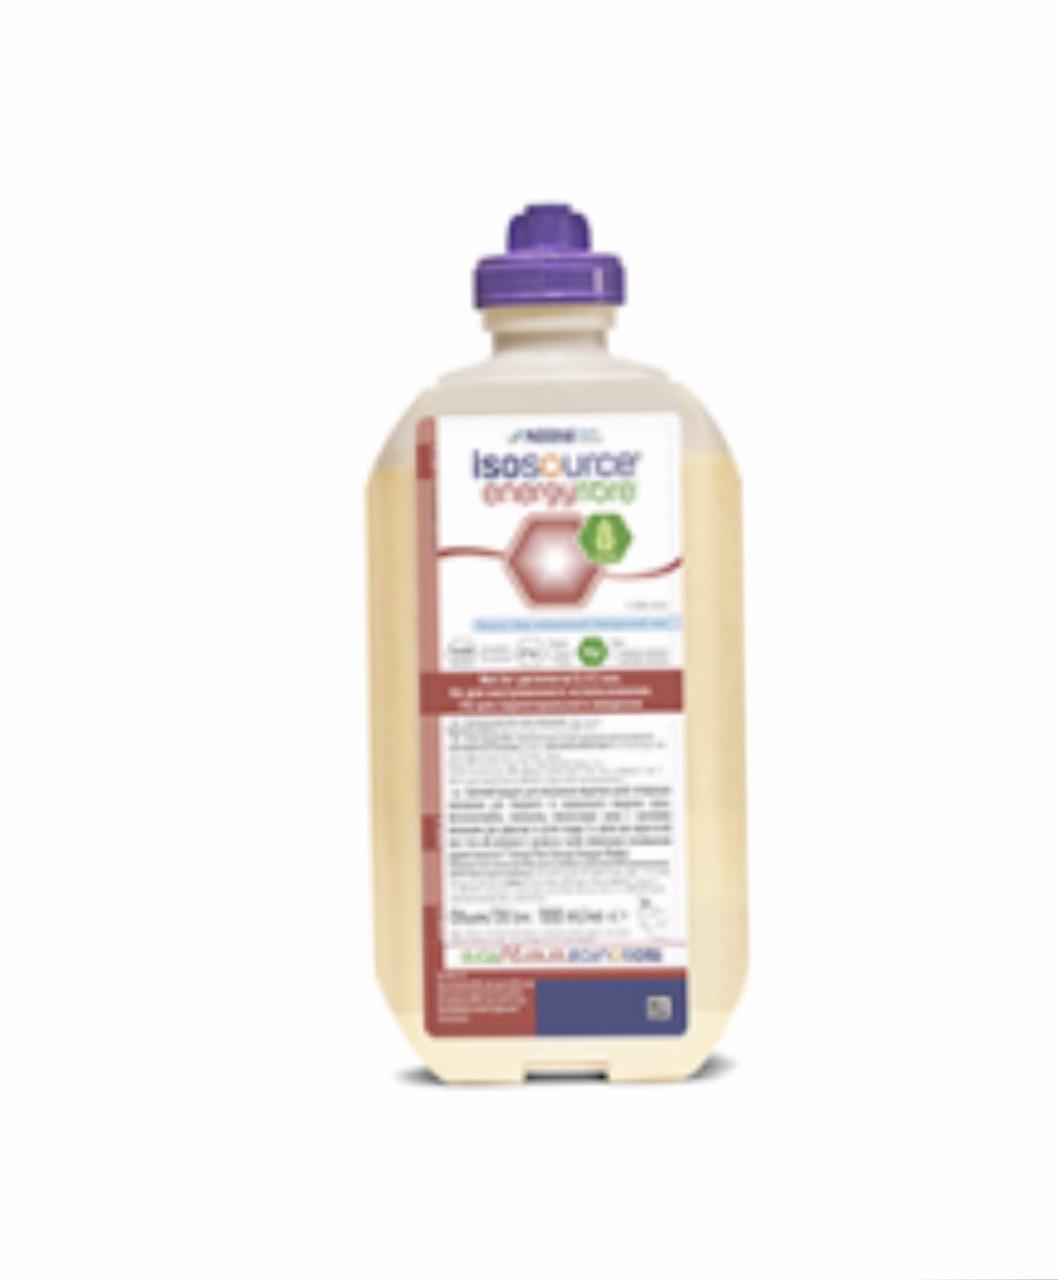 Клiнiчне харчування Nestle Isosource® energy fibre (Изосурс Энерджи Файбе)1000 мл